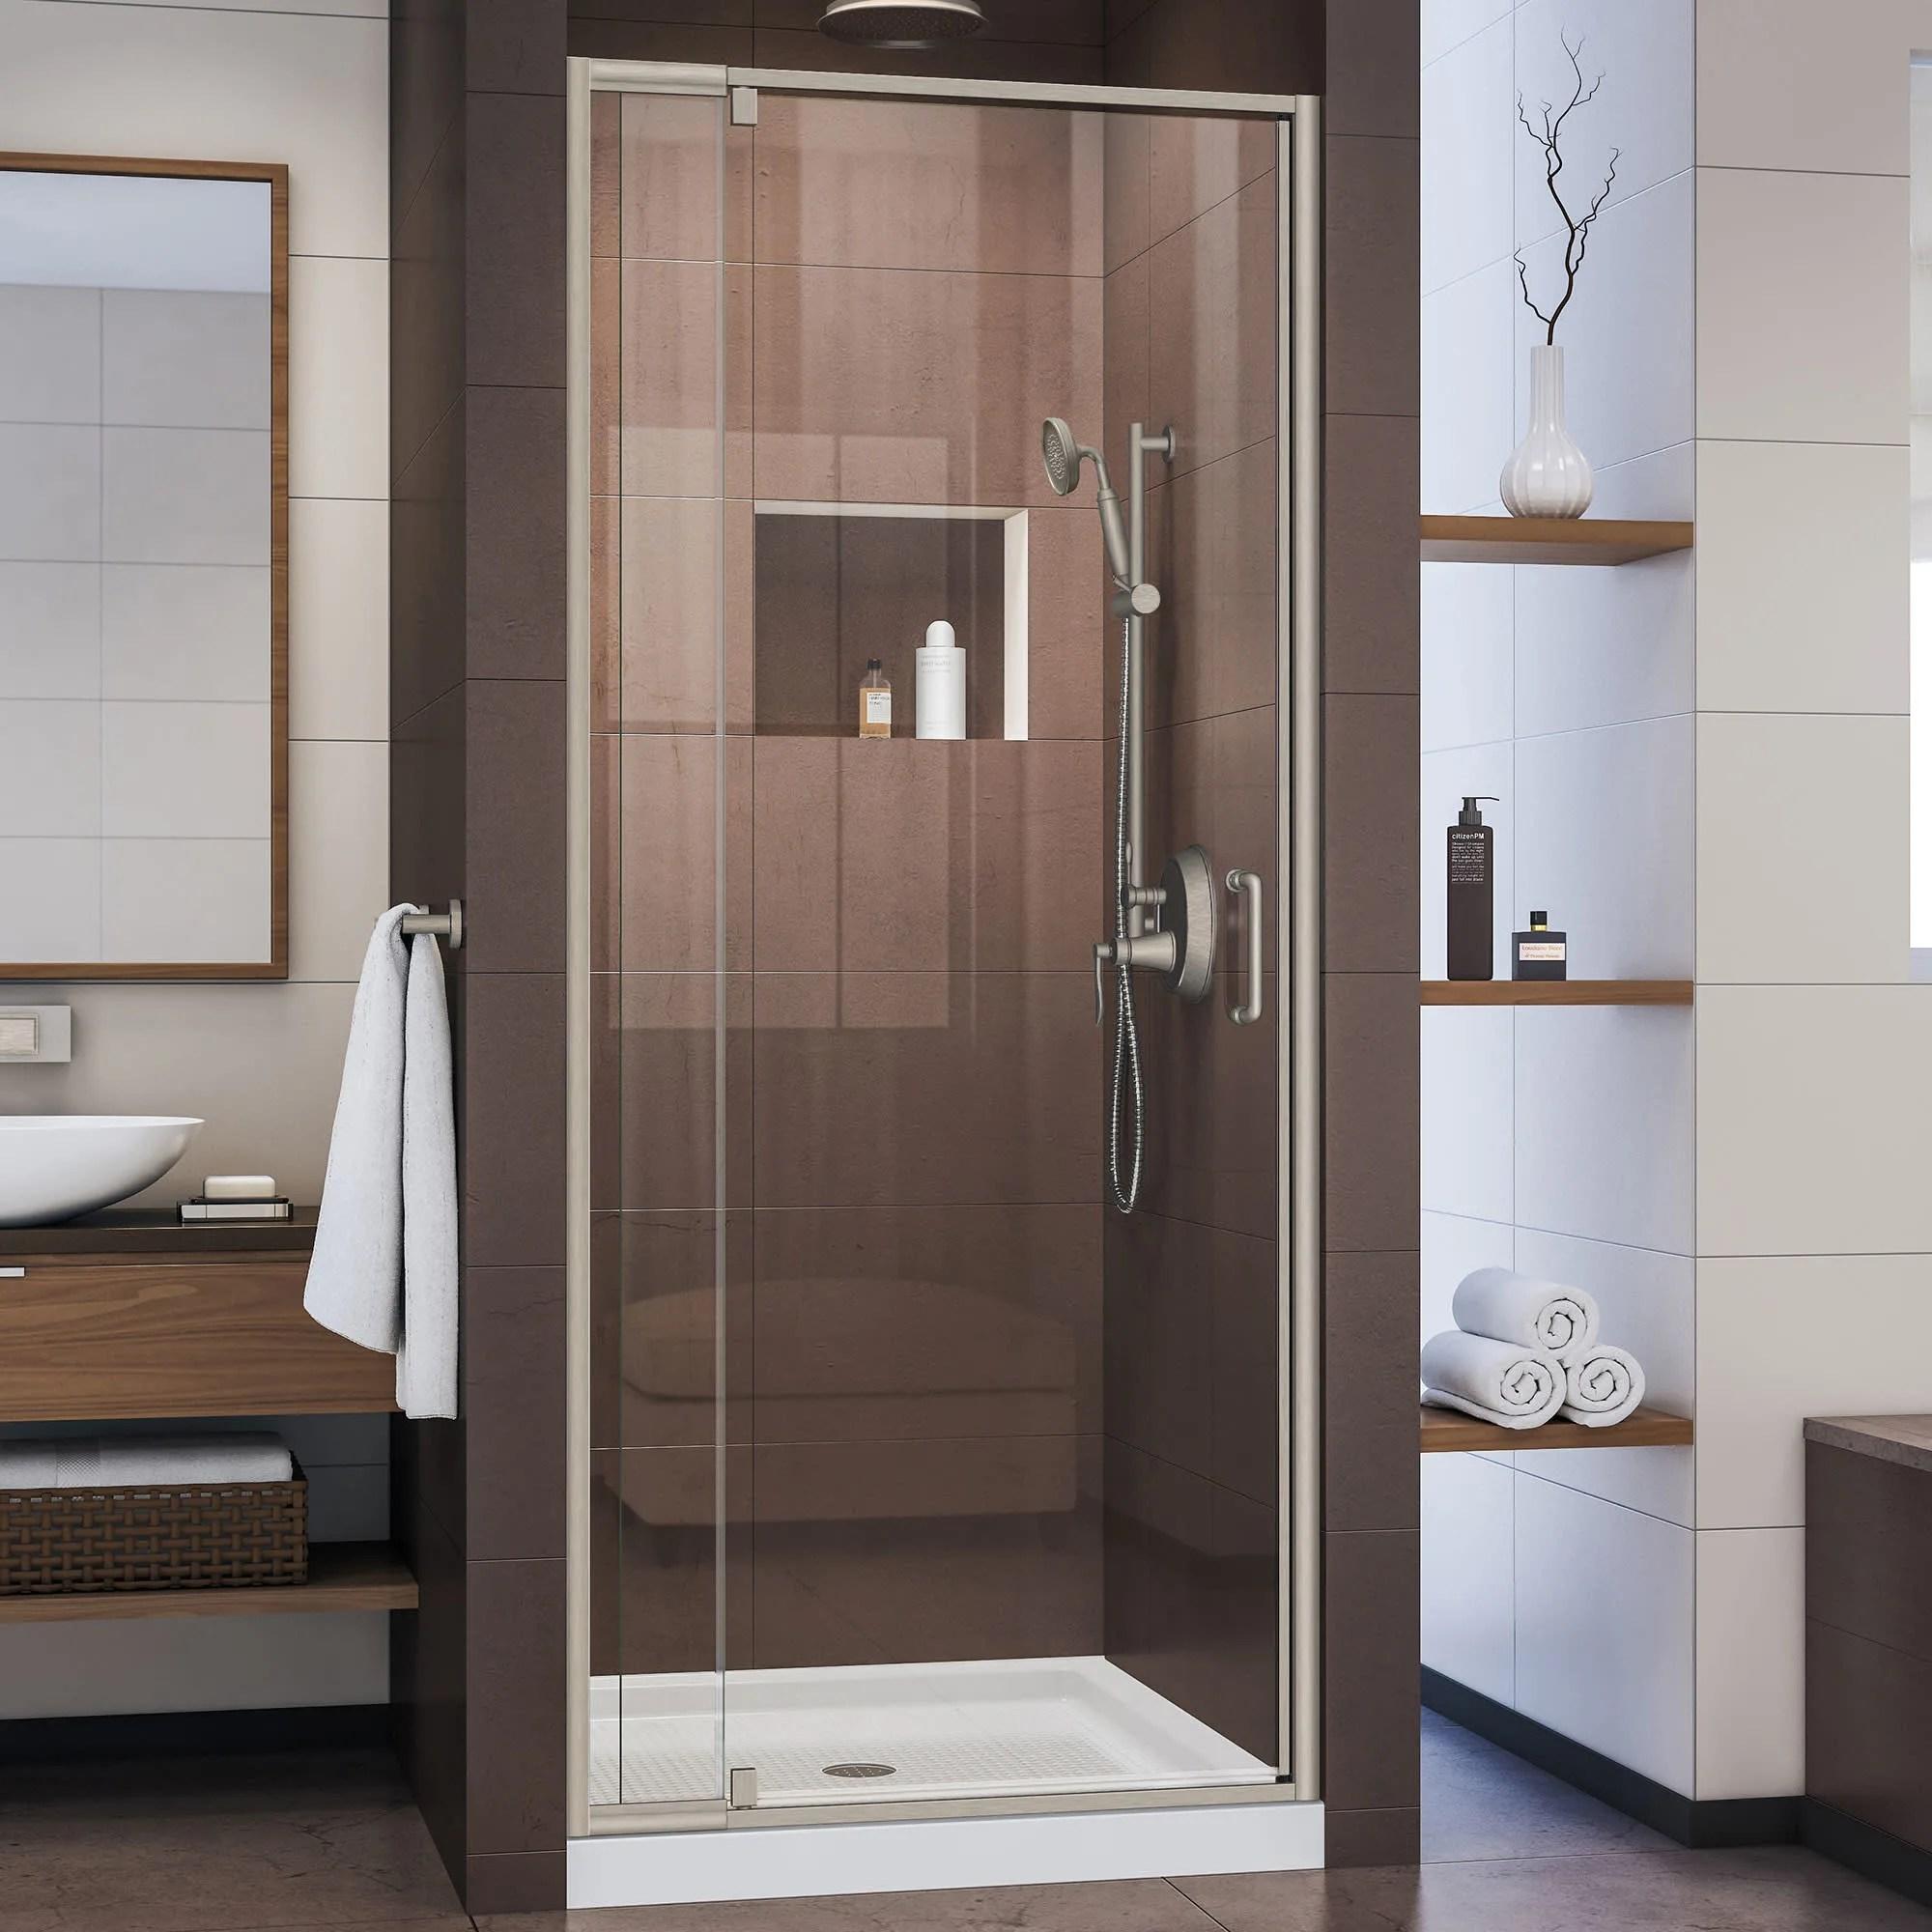 Dreamline Shdr 22327200 Flex Pivot Shower Door 32 36 Wide